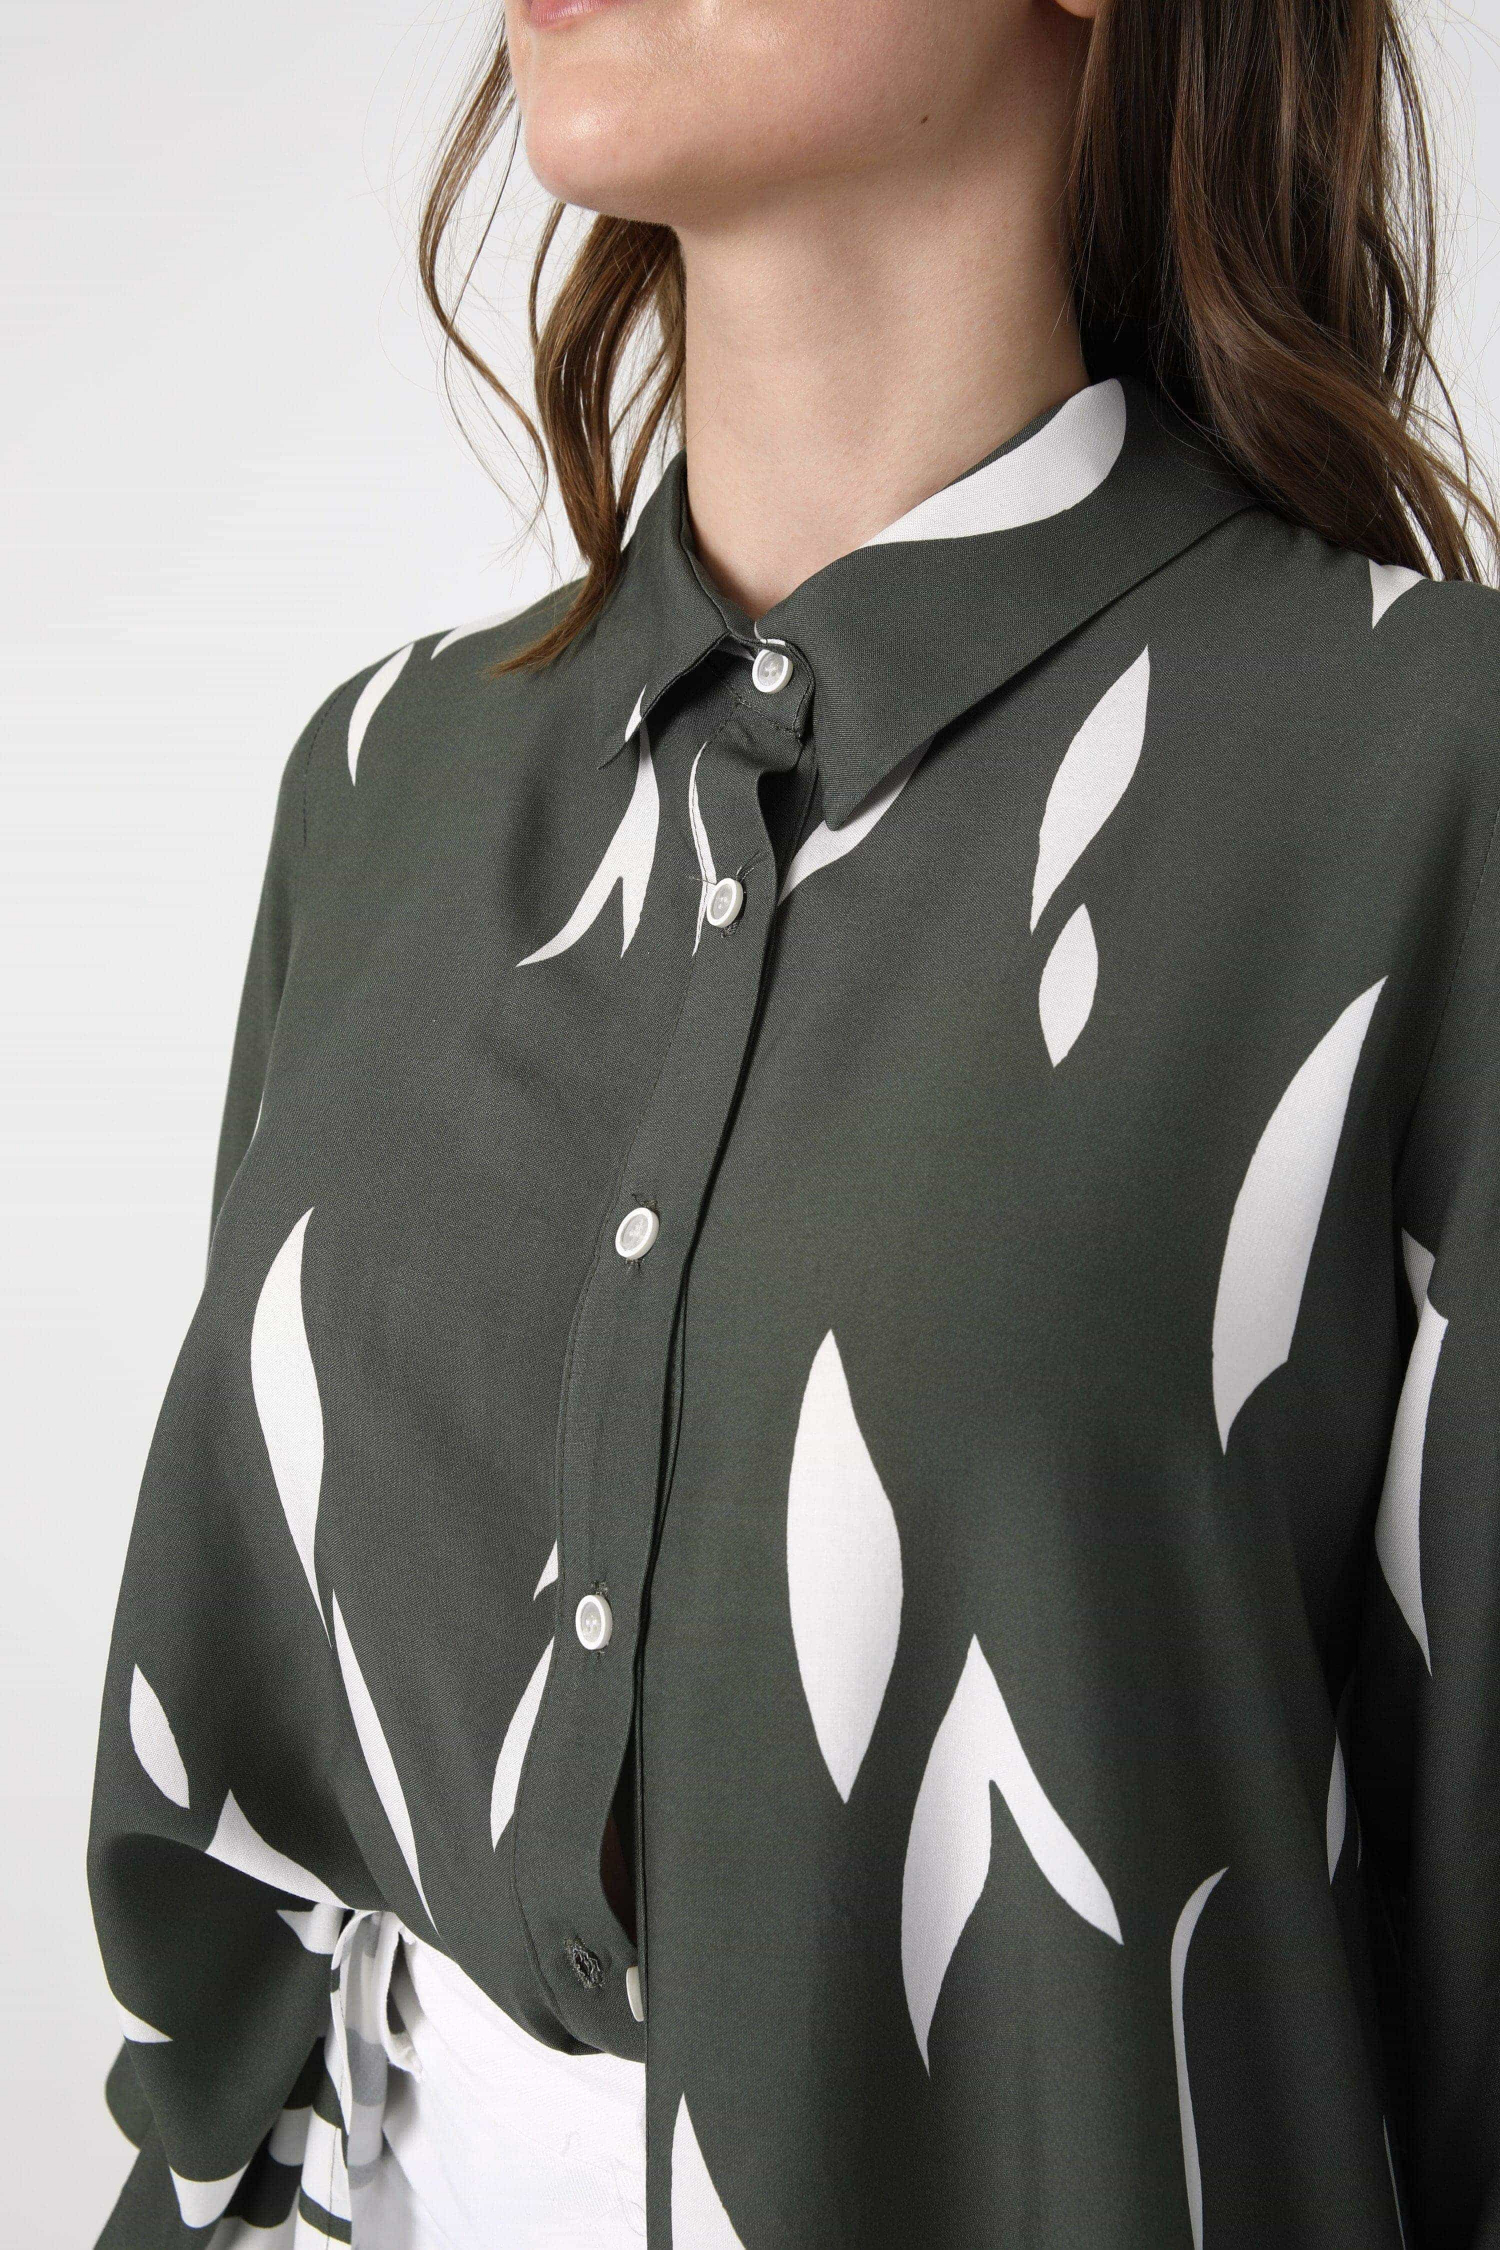 Fibranne shirt design with printed base